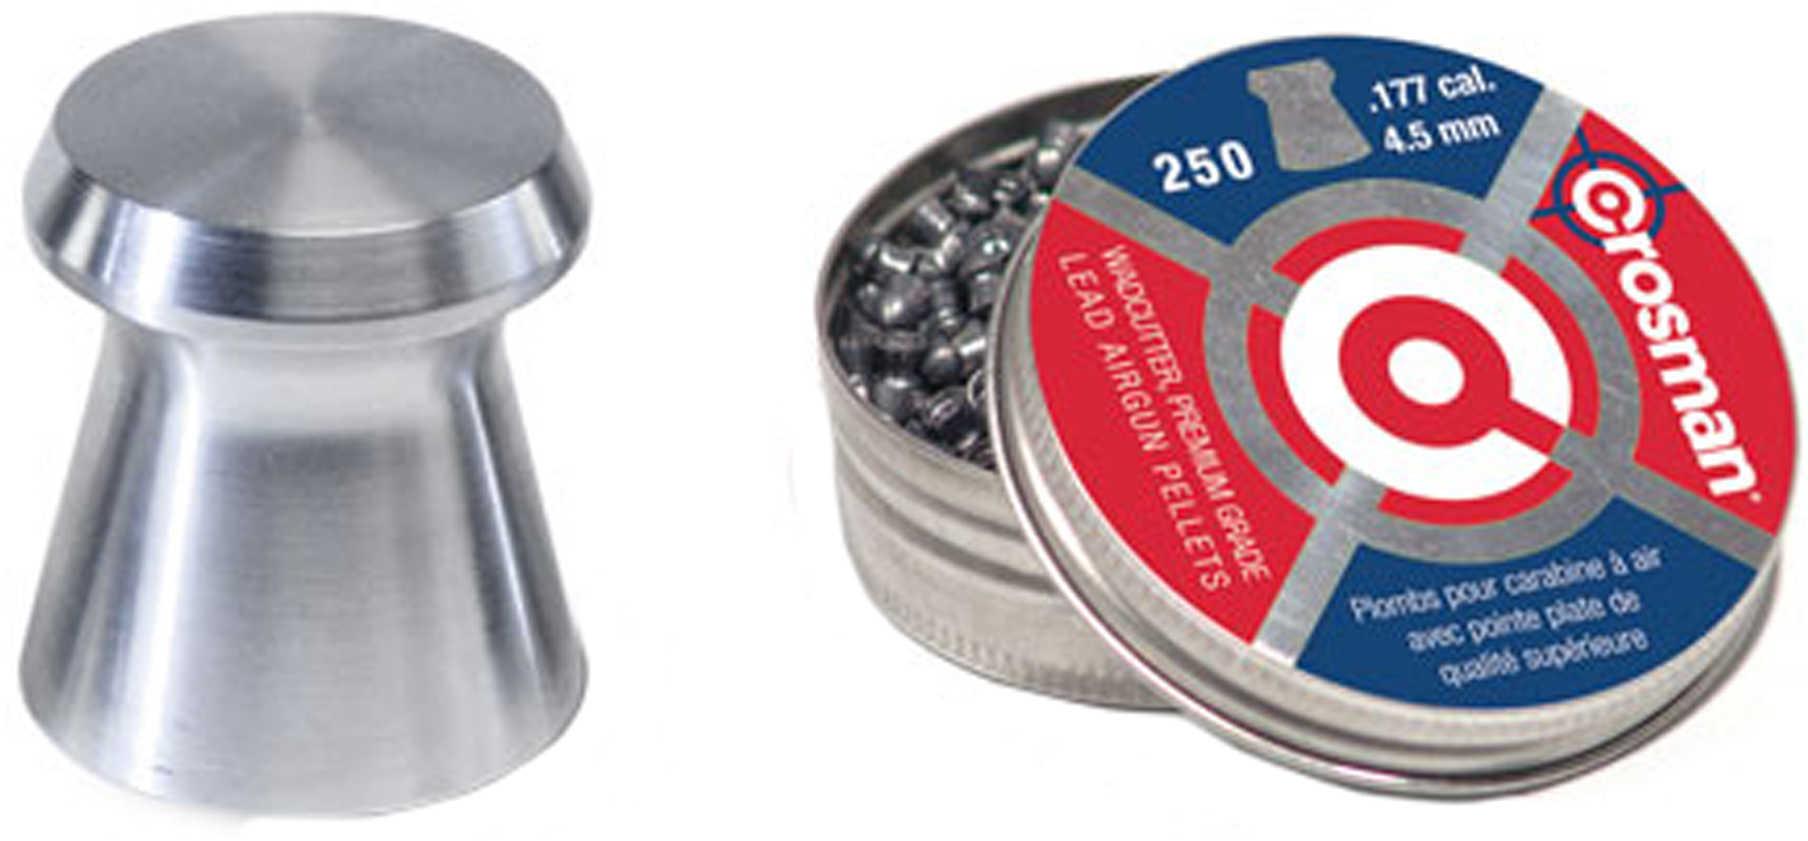 Crosman .177 Caliber Pellet Blister Pack/250 Count Md: 6177